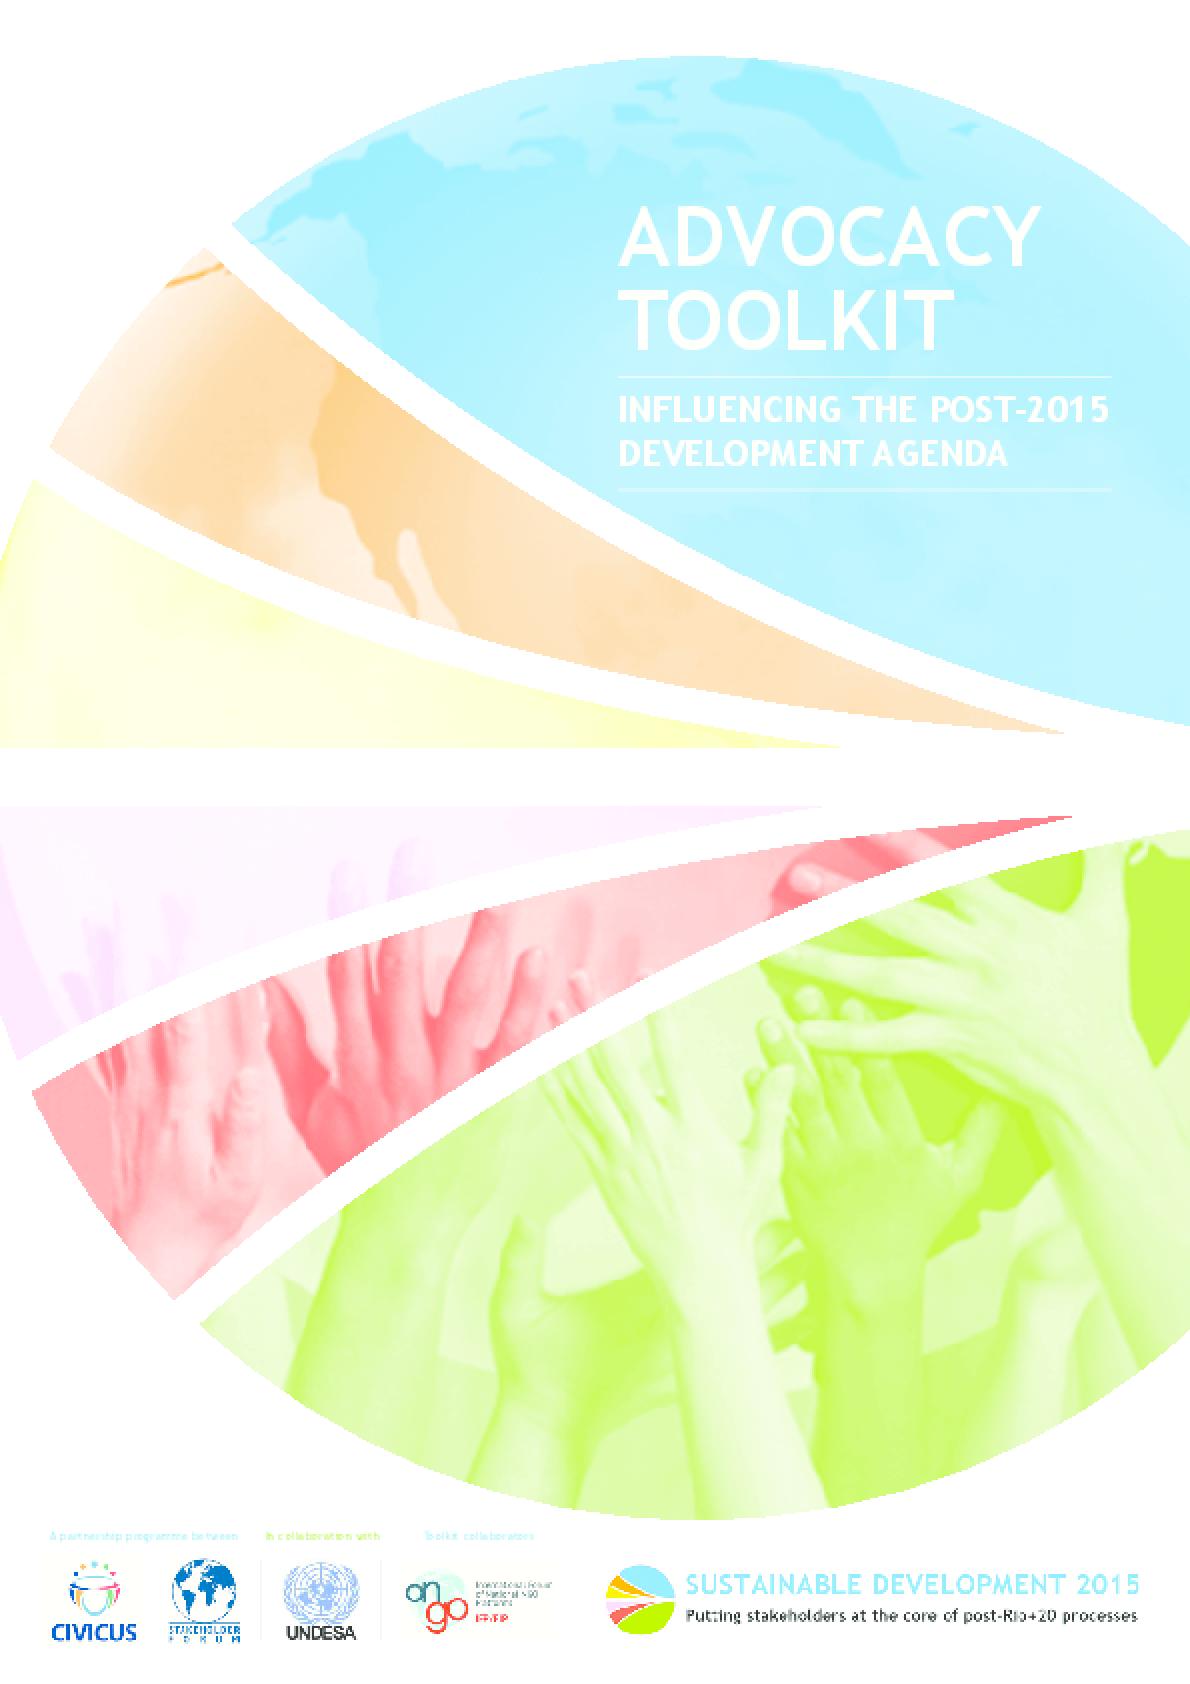 Advocacy Toolkit: Influencing the post-2015 Development Agenda